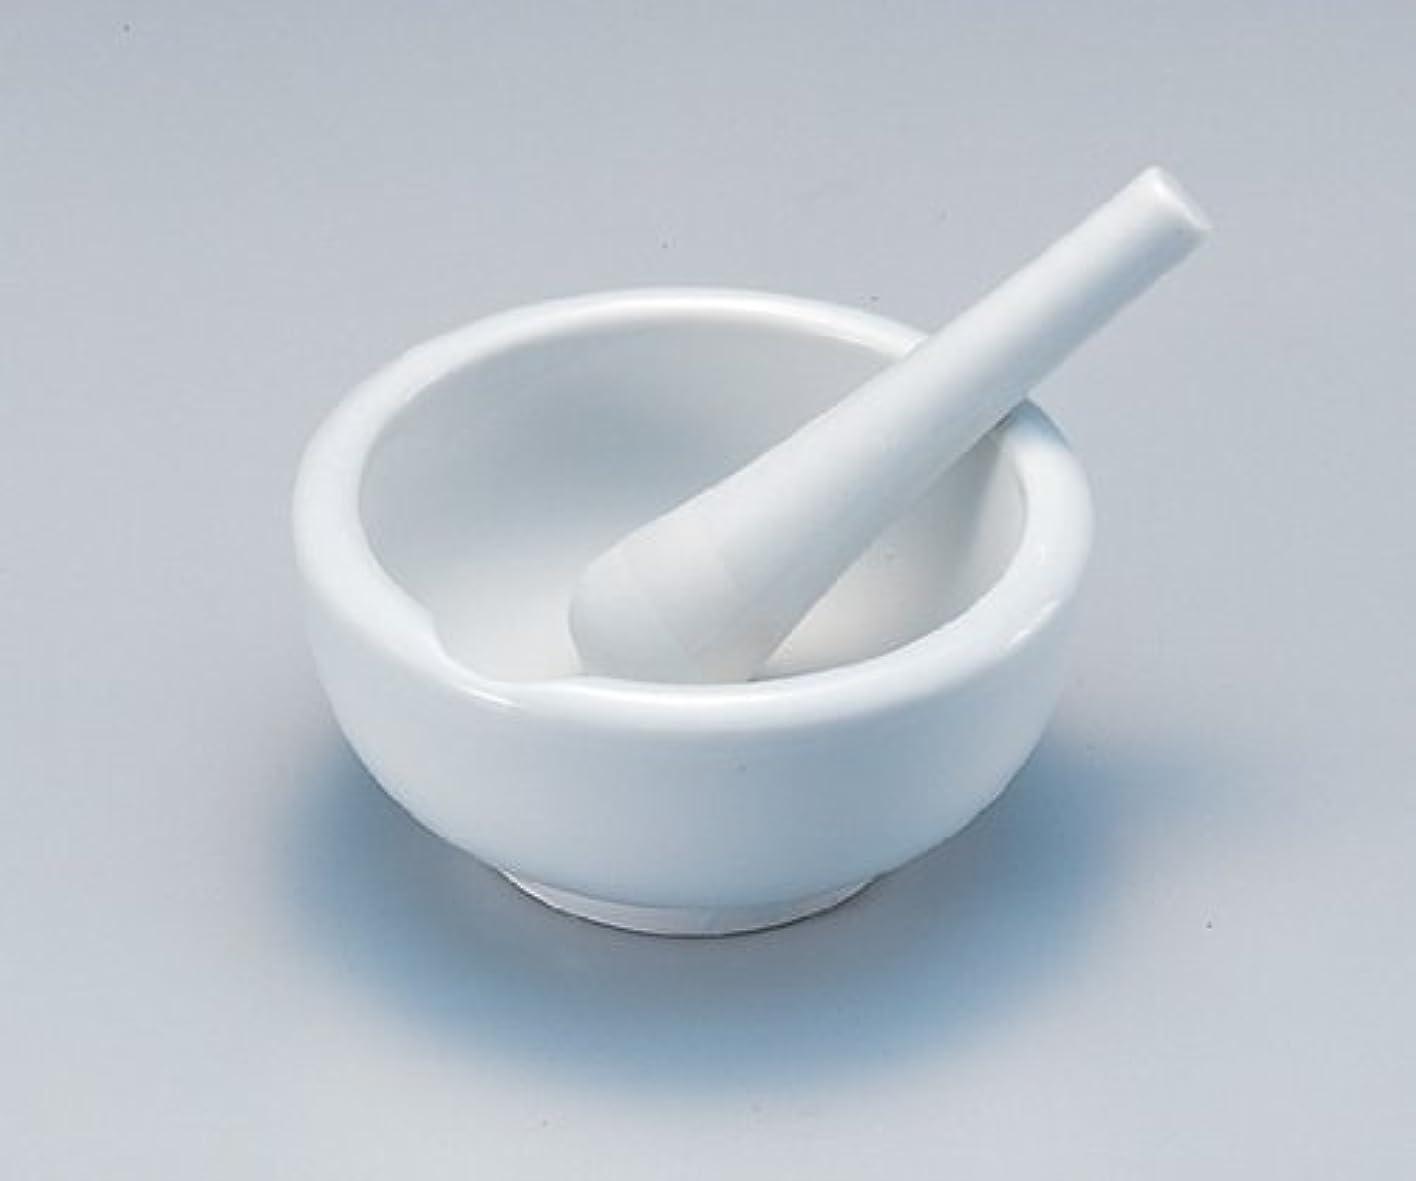 膿瘍ペルメル立場磁製乳鉢 90mm  乳棒付